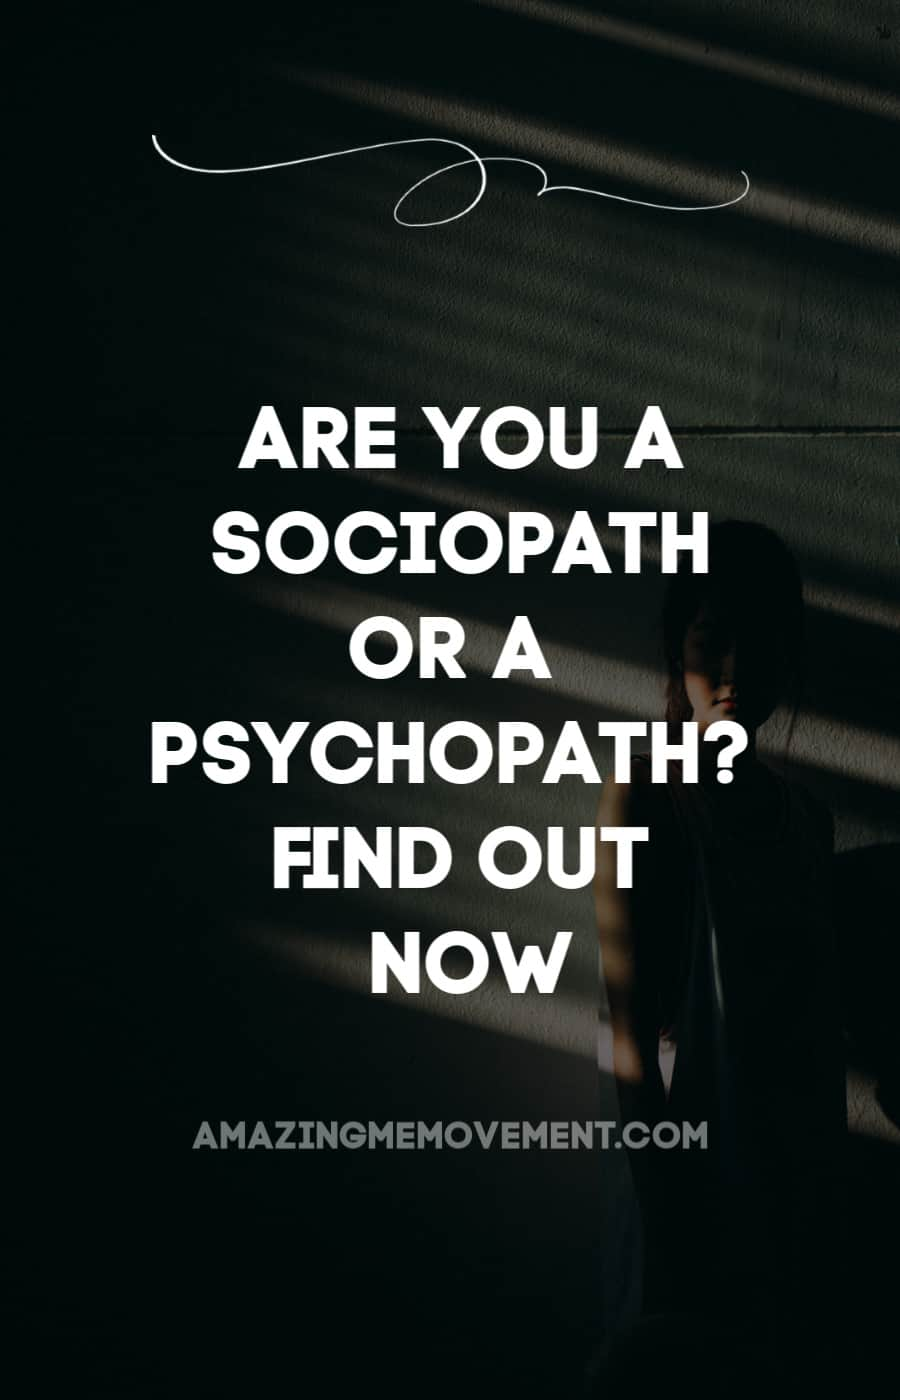 are you a sociopath or a psychopath quiz